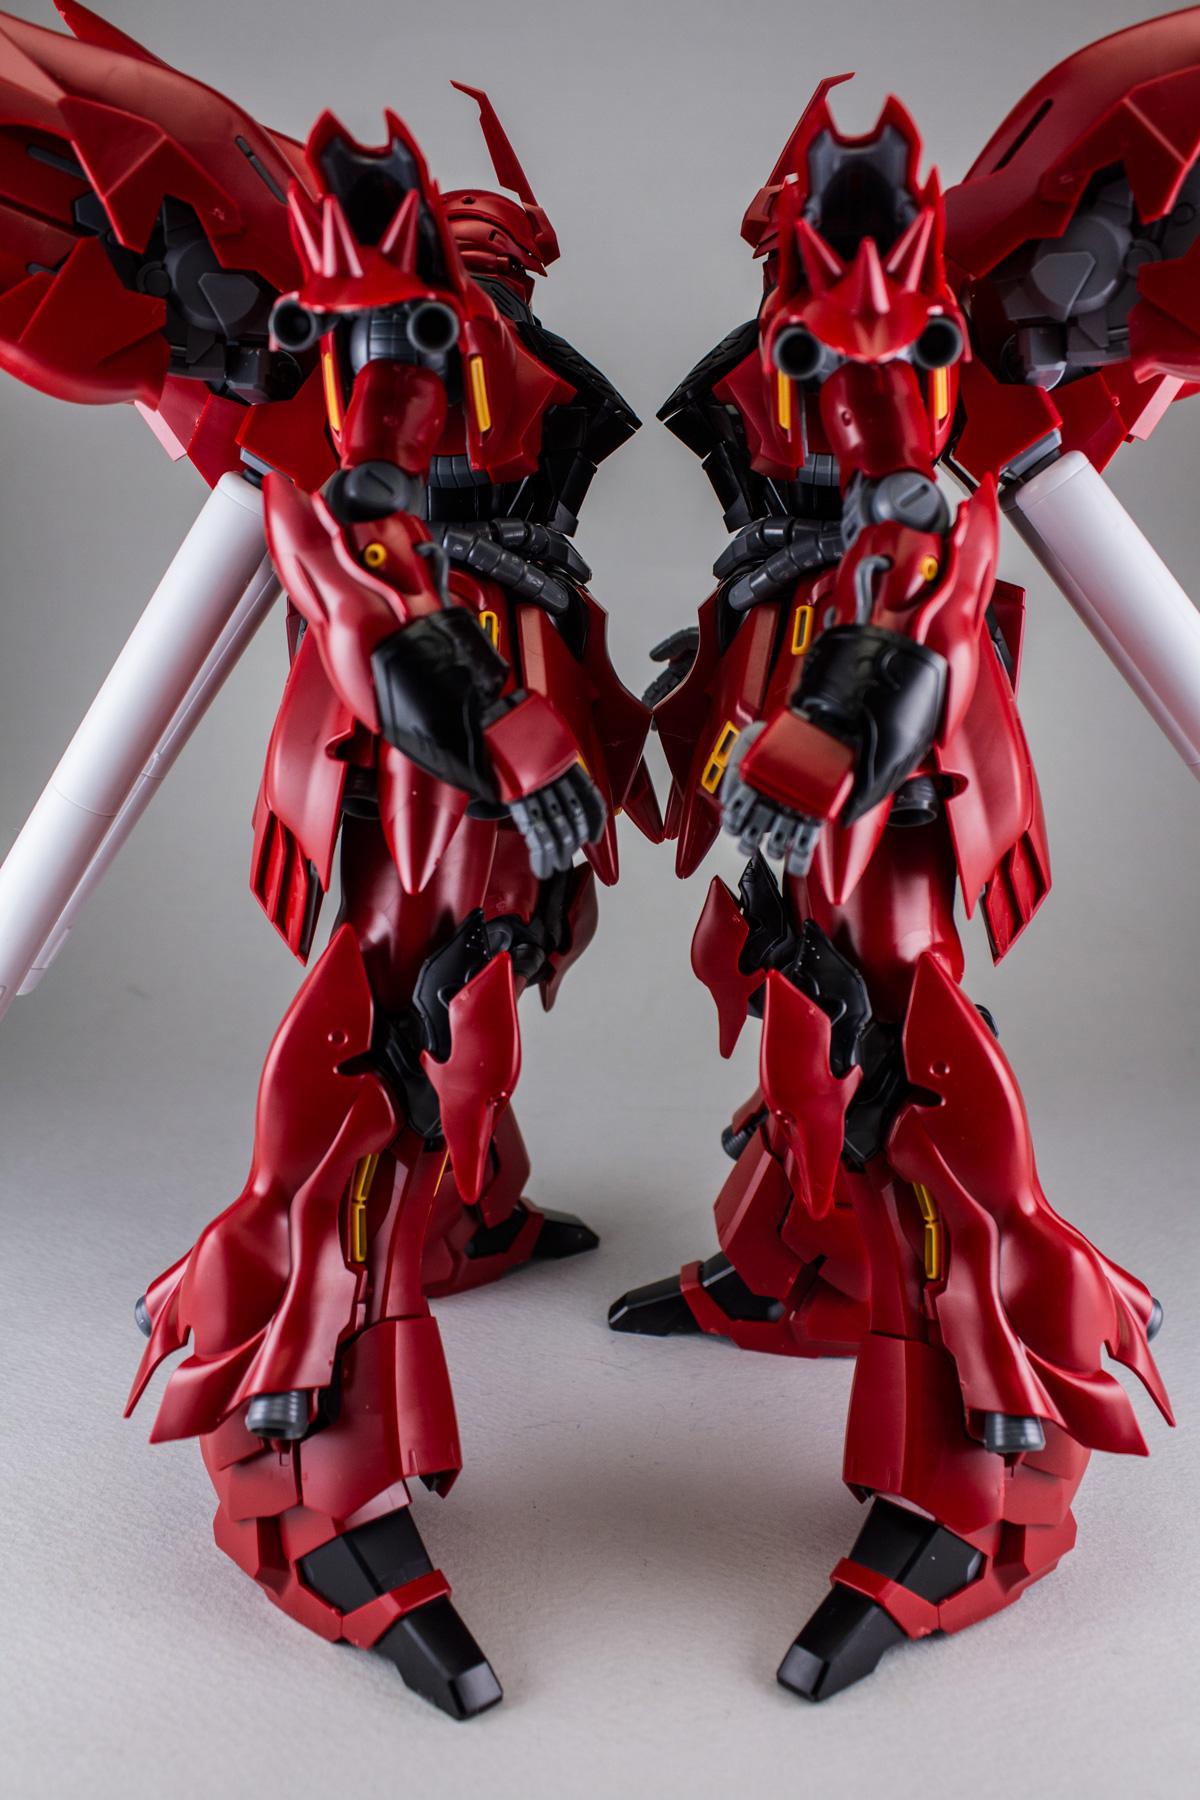 Pictures Of Sazabi Vs Sinanju Gundam Rx 93 V Nu Ver Ka Master Grade 1100 Daban Model Gunpla Tv Episode 110 Mg Ova Or A